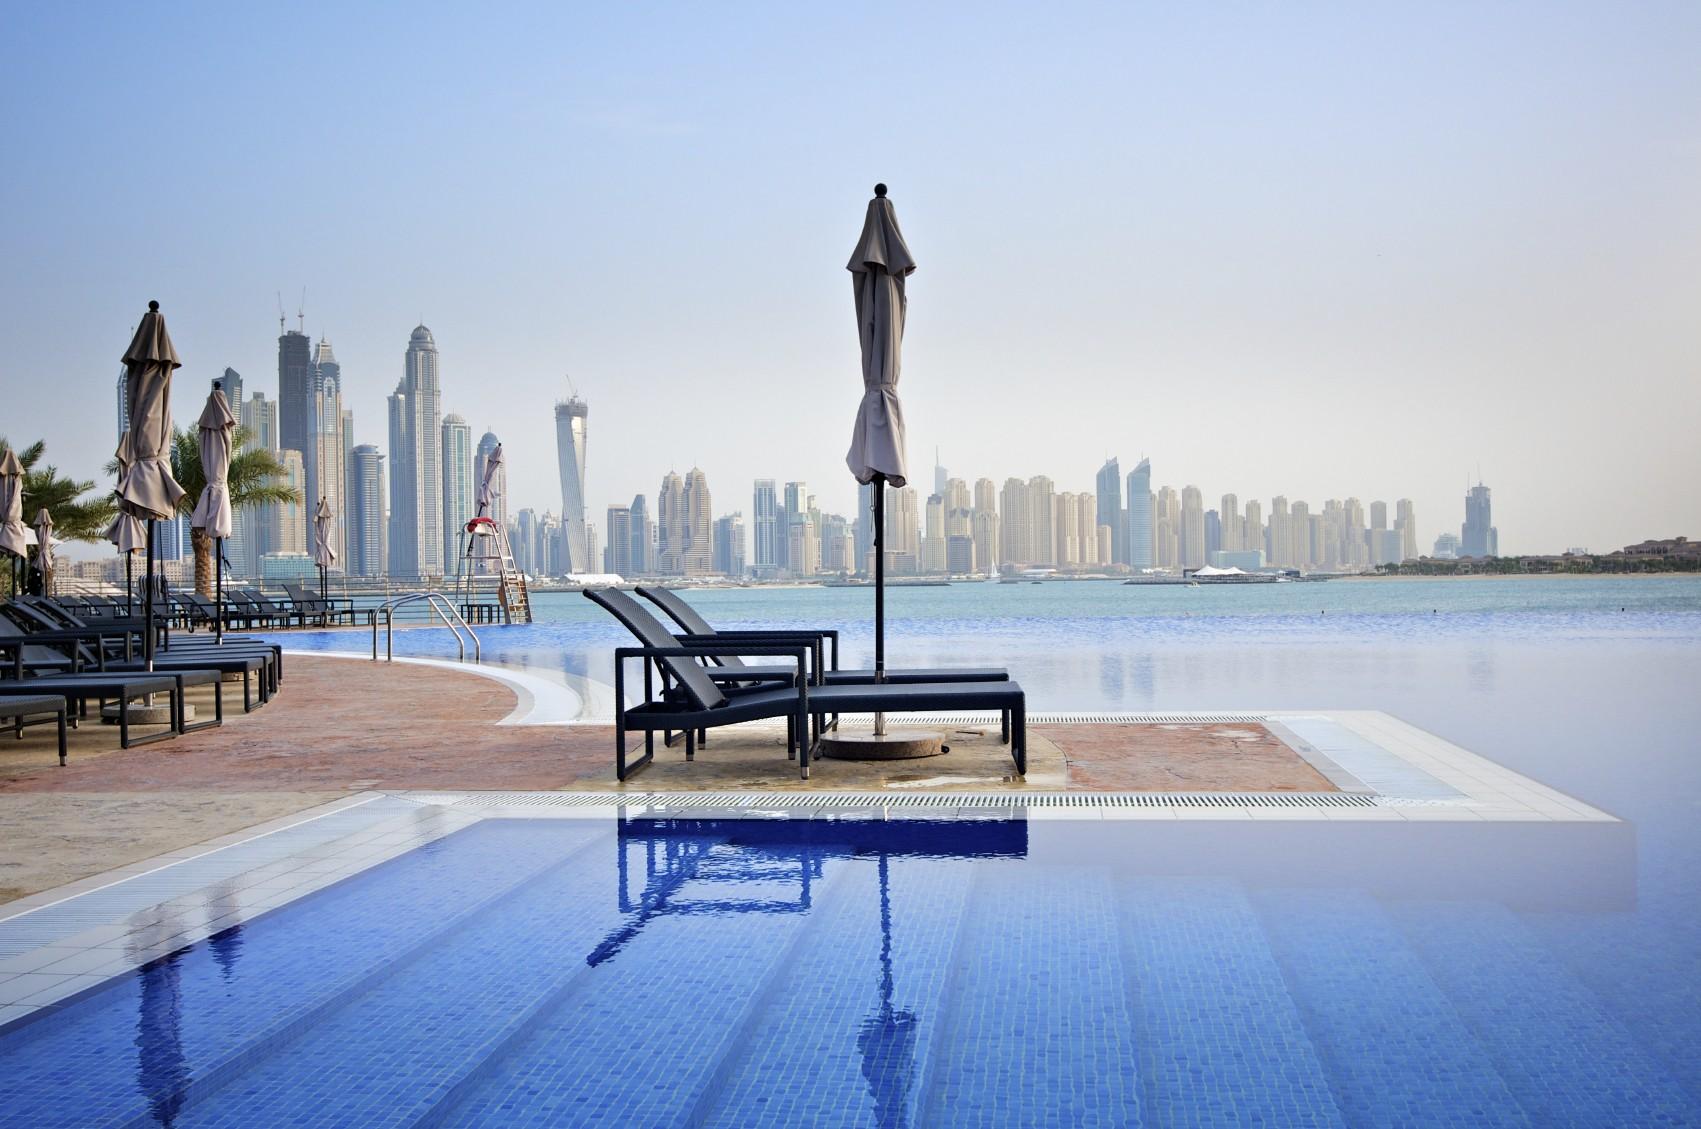 britishairways_Dubai_Pool.jpg